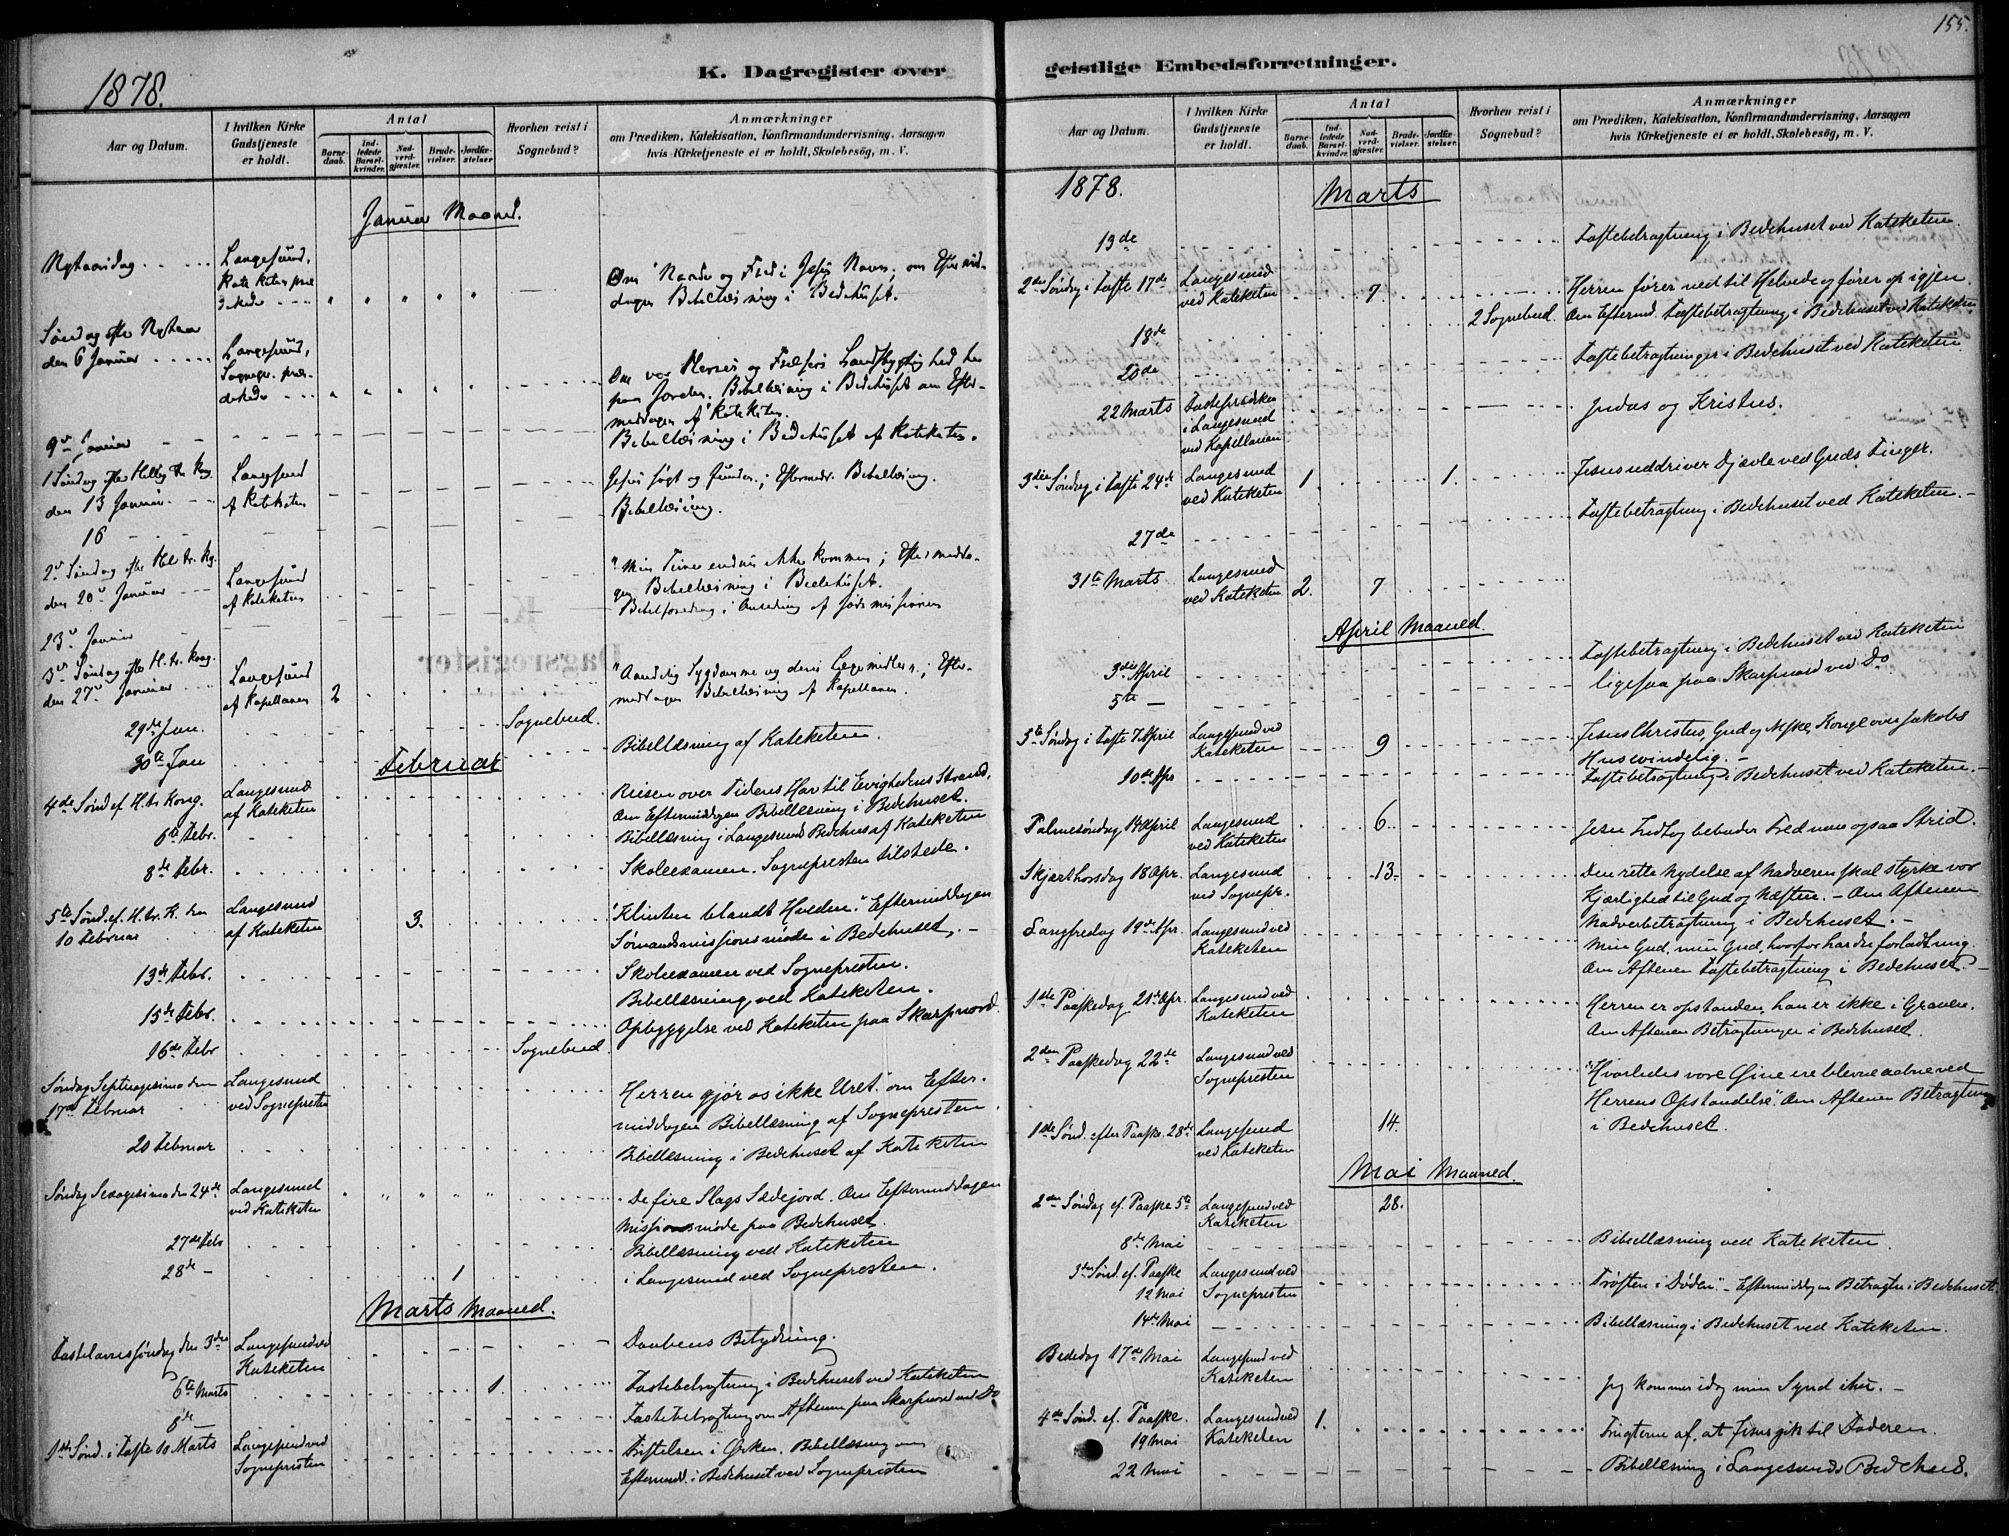 SAKO, Langesund kirkebøker, F/Fa/L0002: Ministerialbok nr. 2, 1878-1892, s. 155